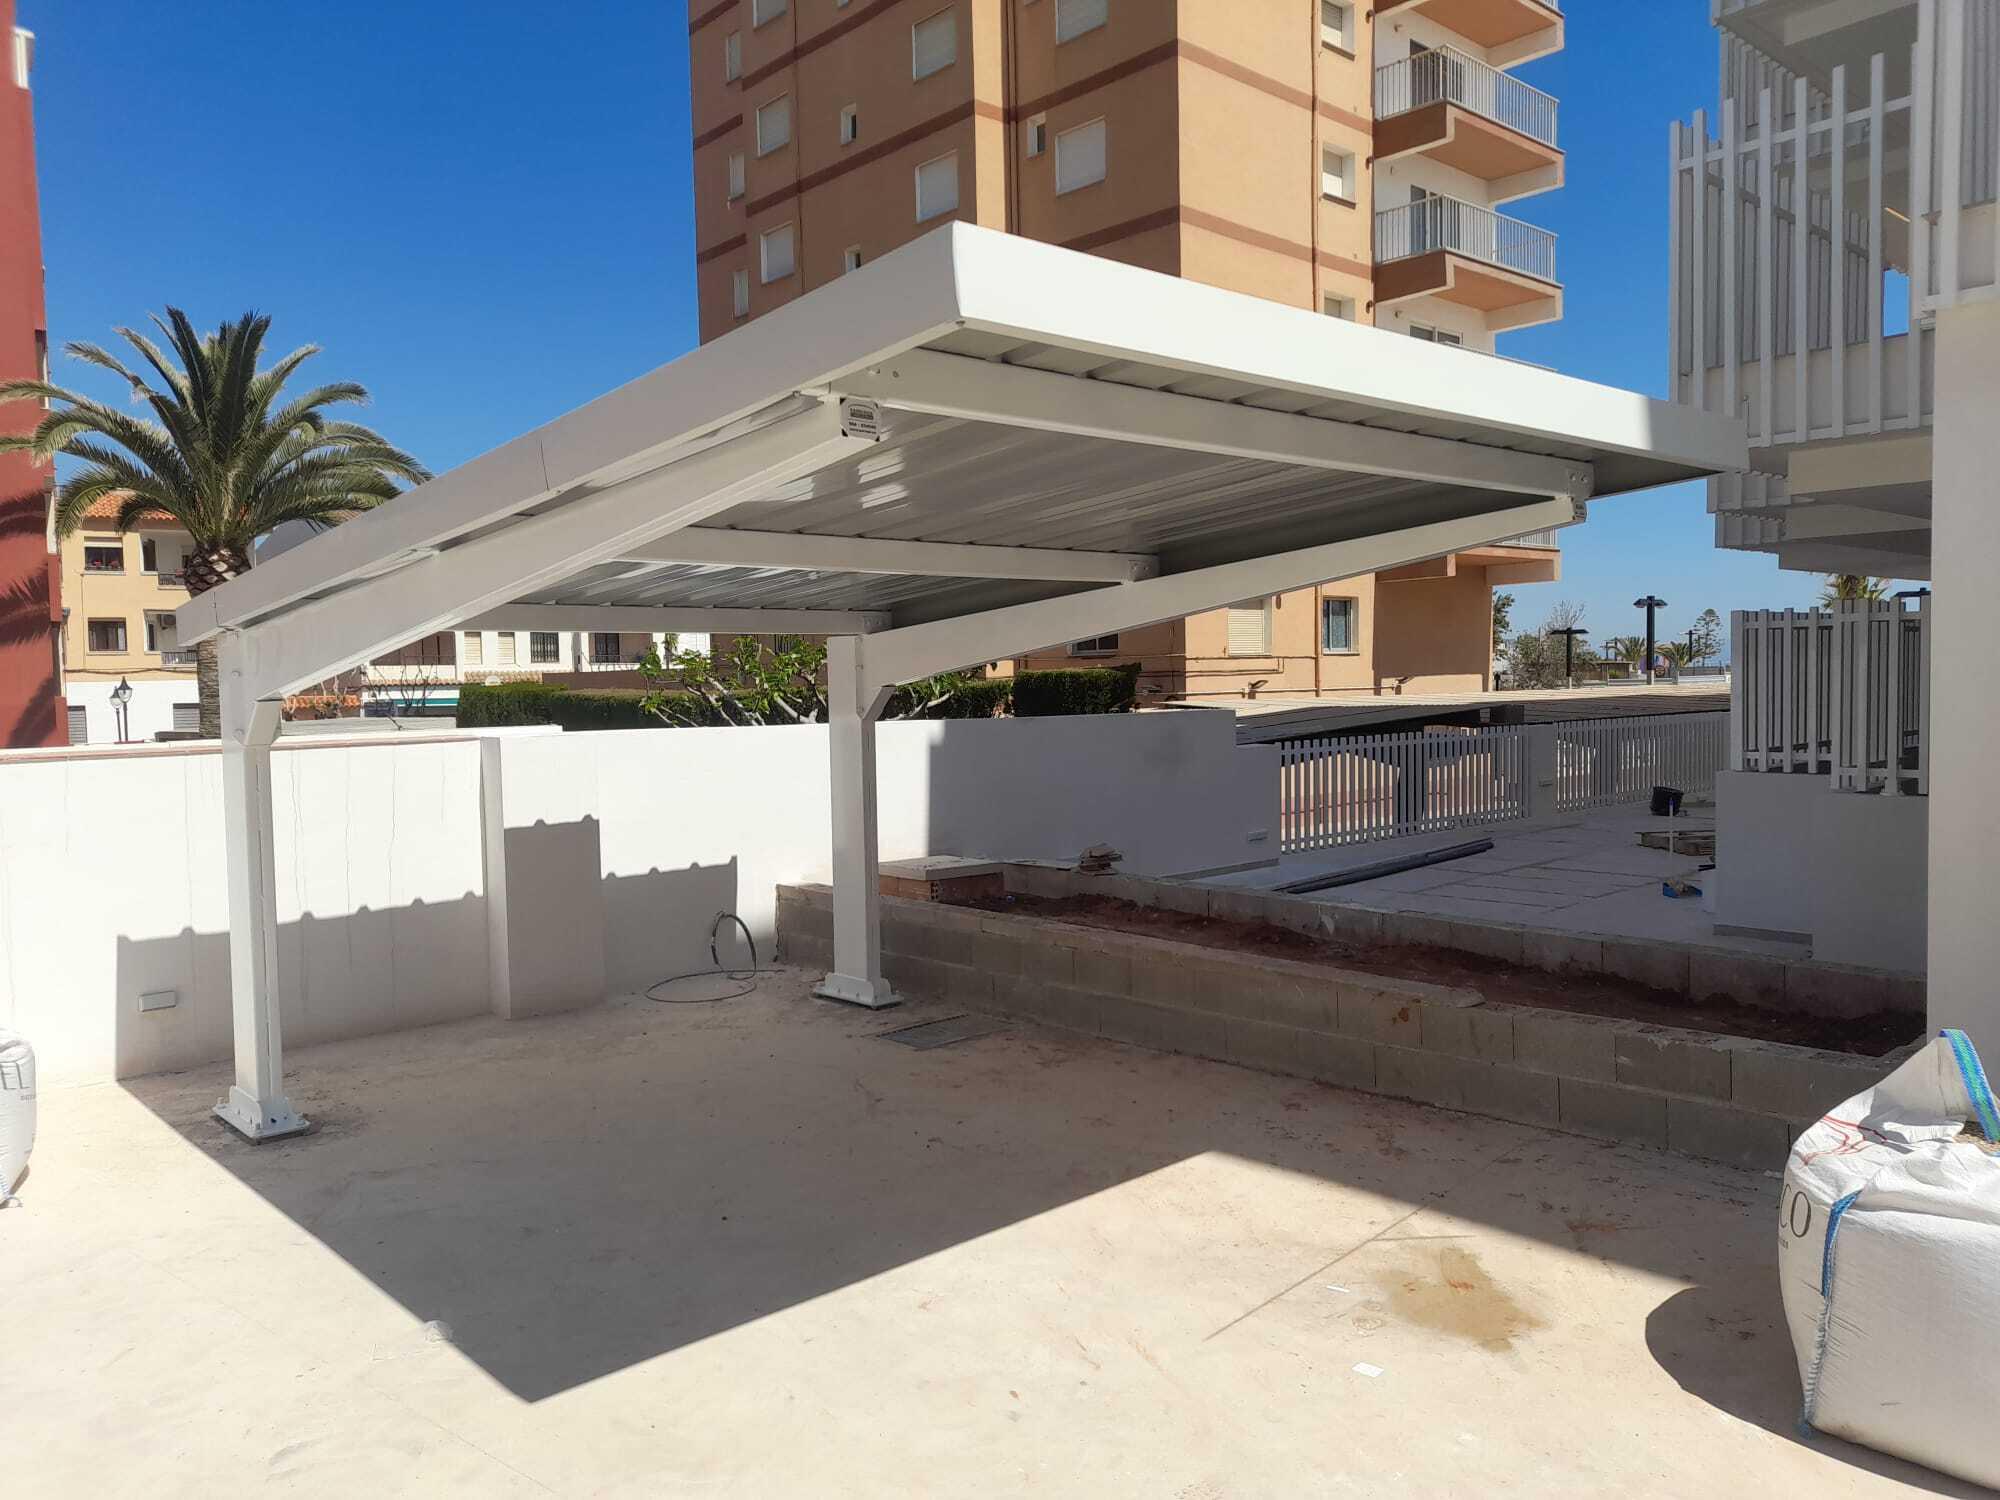 "IMG 20210505 WA0008 - Parking 11+1 coches residencial ""Playa Blanca"" Morro de Gos - Oropesa"